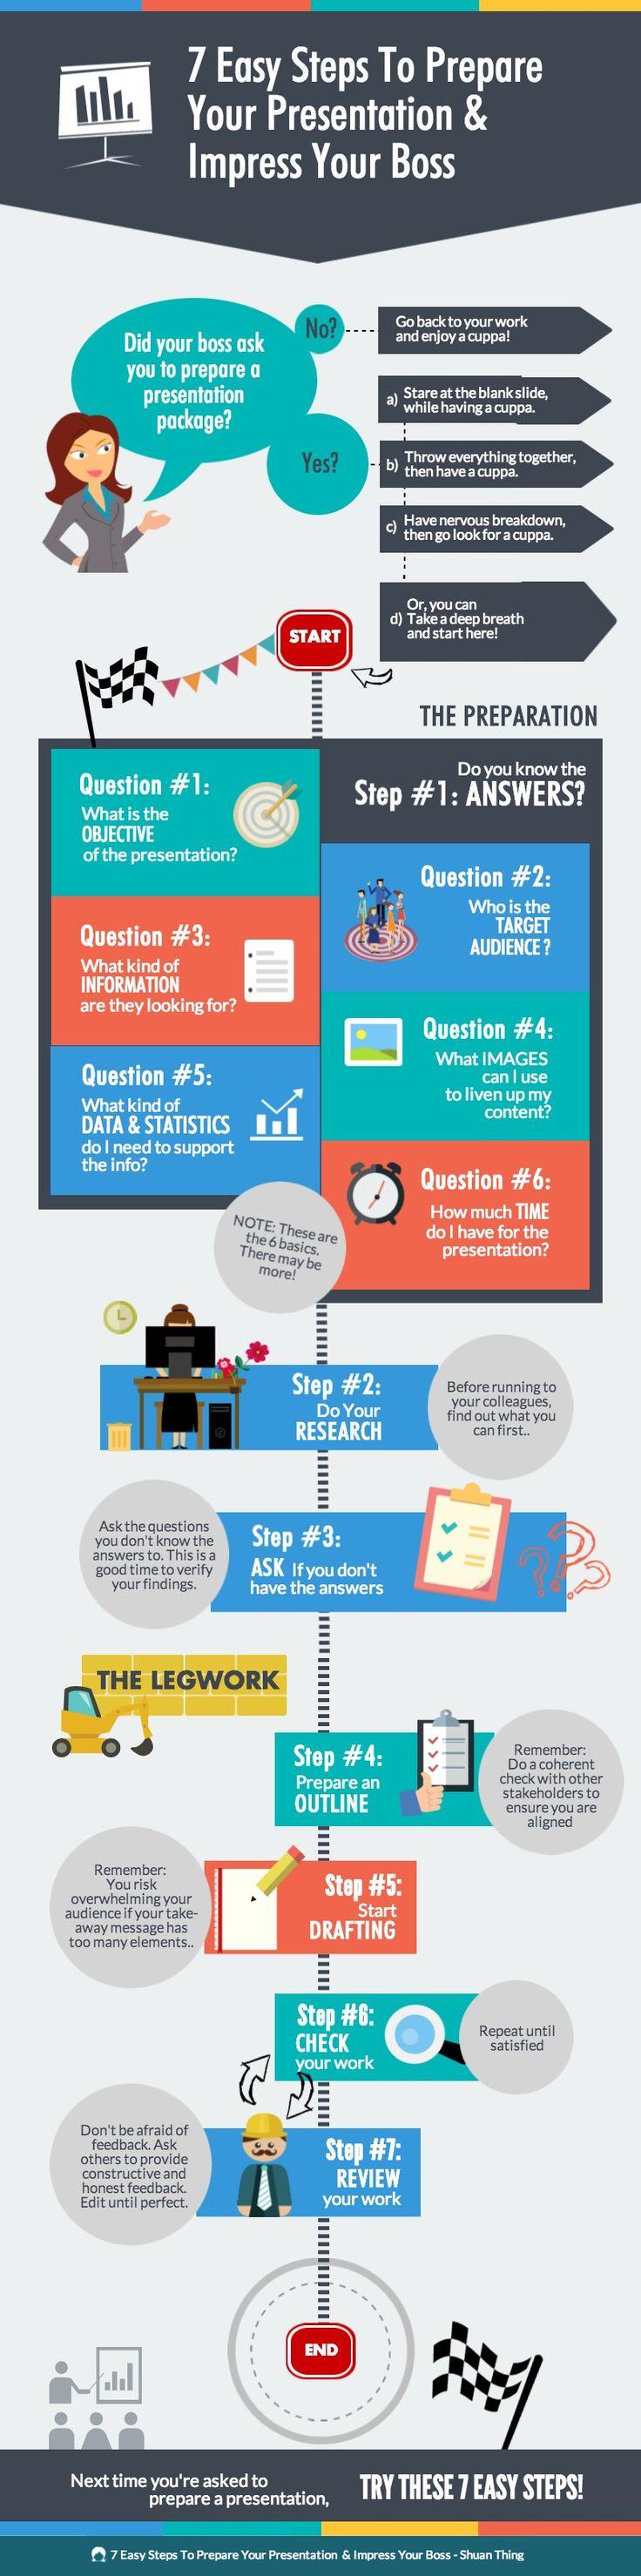 prepare winning  presentation impress your boss